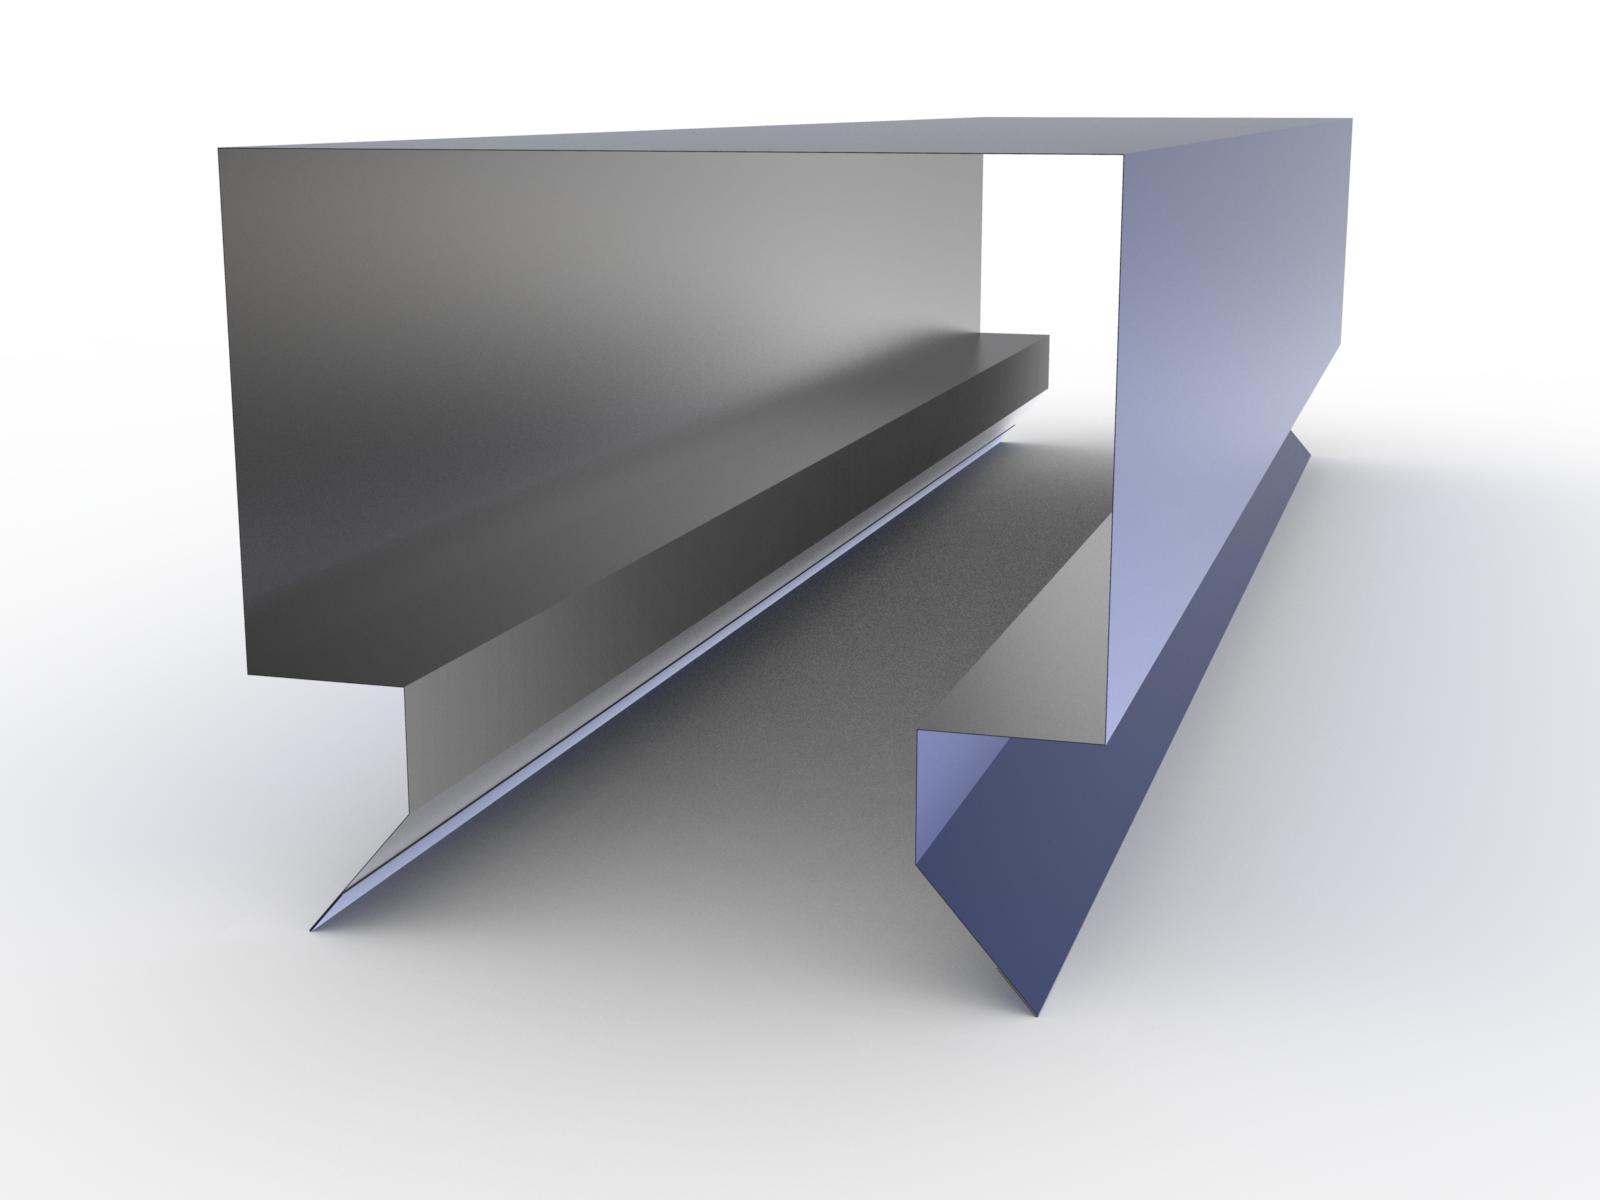 Chapa minionda metalico